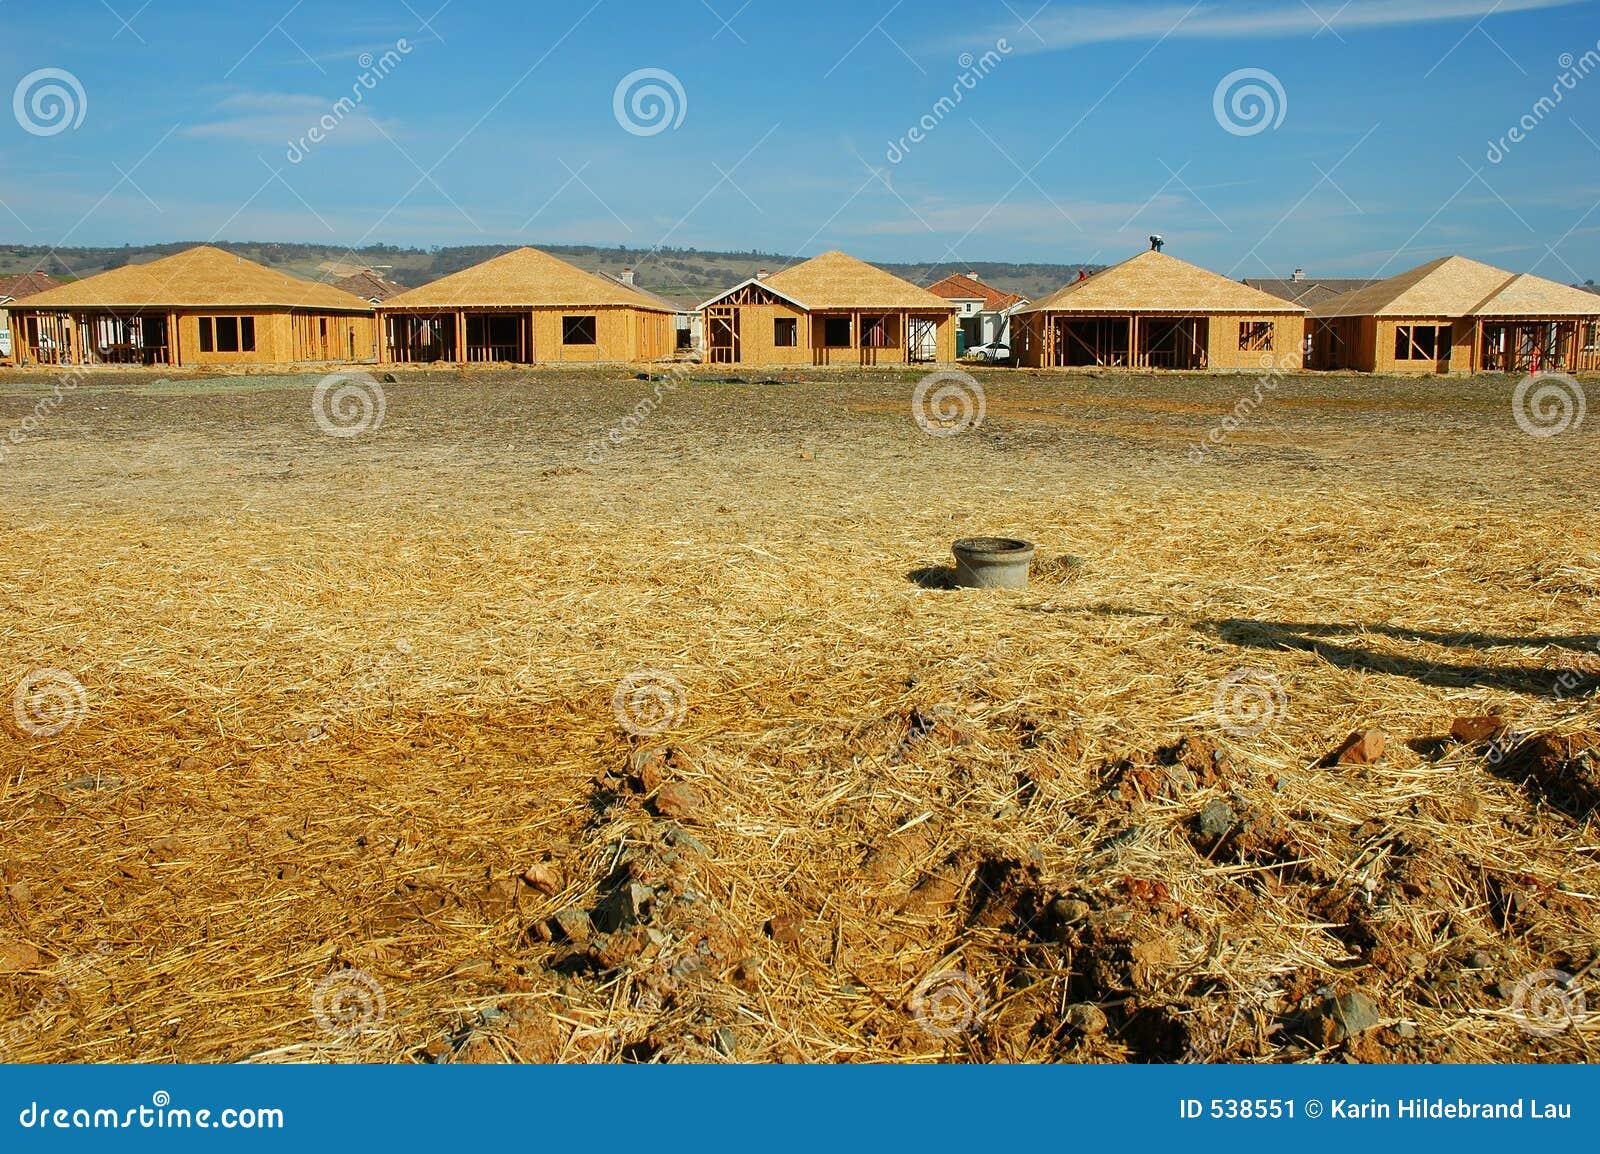 Download 房子行 库存图片. 图片 包括有 实际, 木匠, 位于, 梦想, 抵押, 庄园, 生活方式, 建筑, 消耗大 - 538551